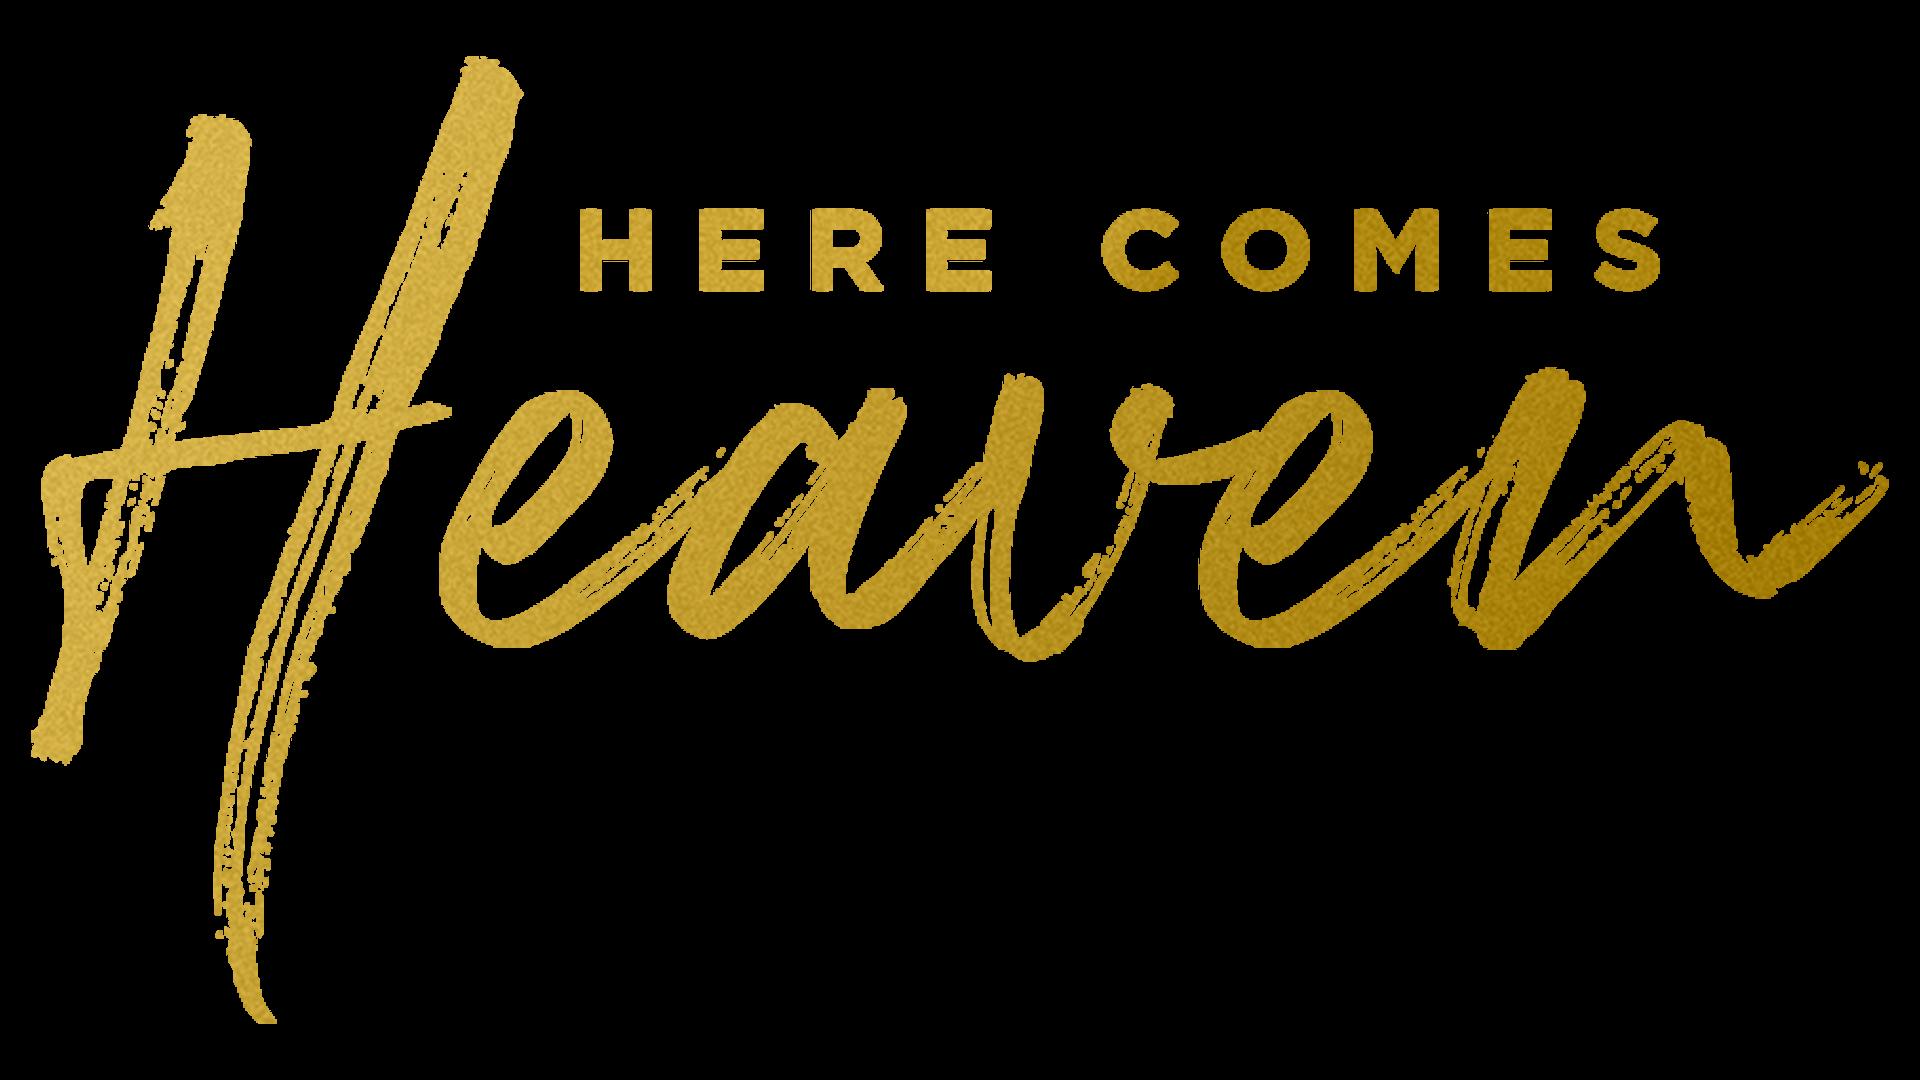 HereComesHeaven-logo